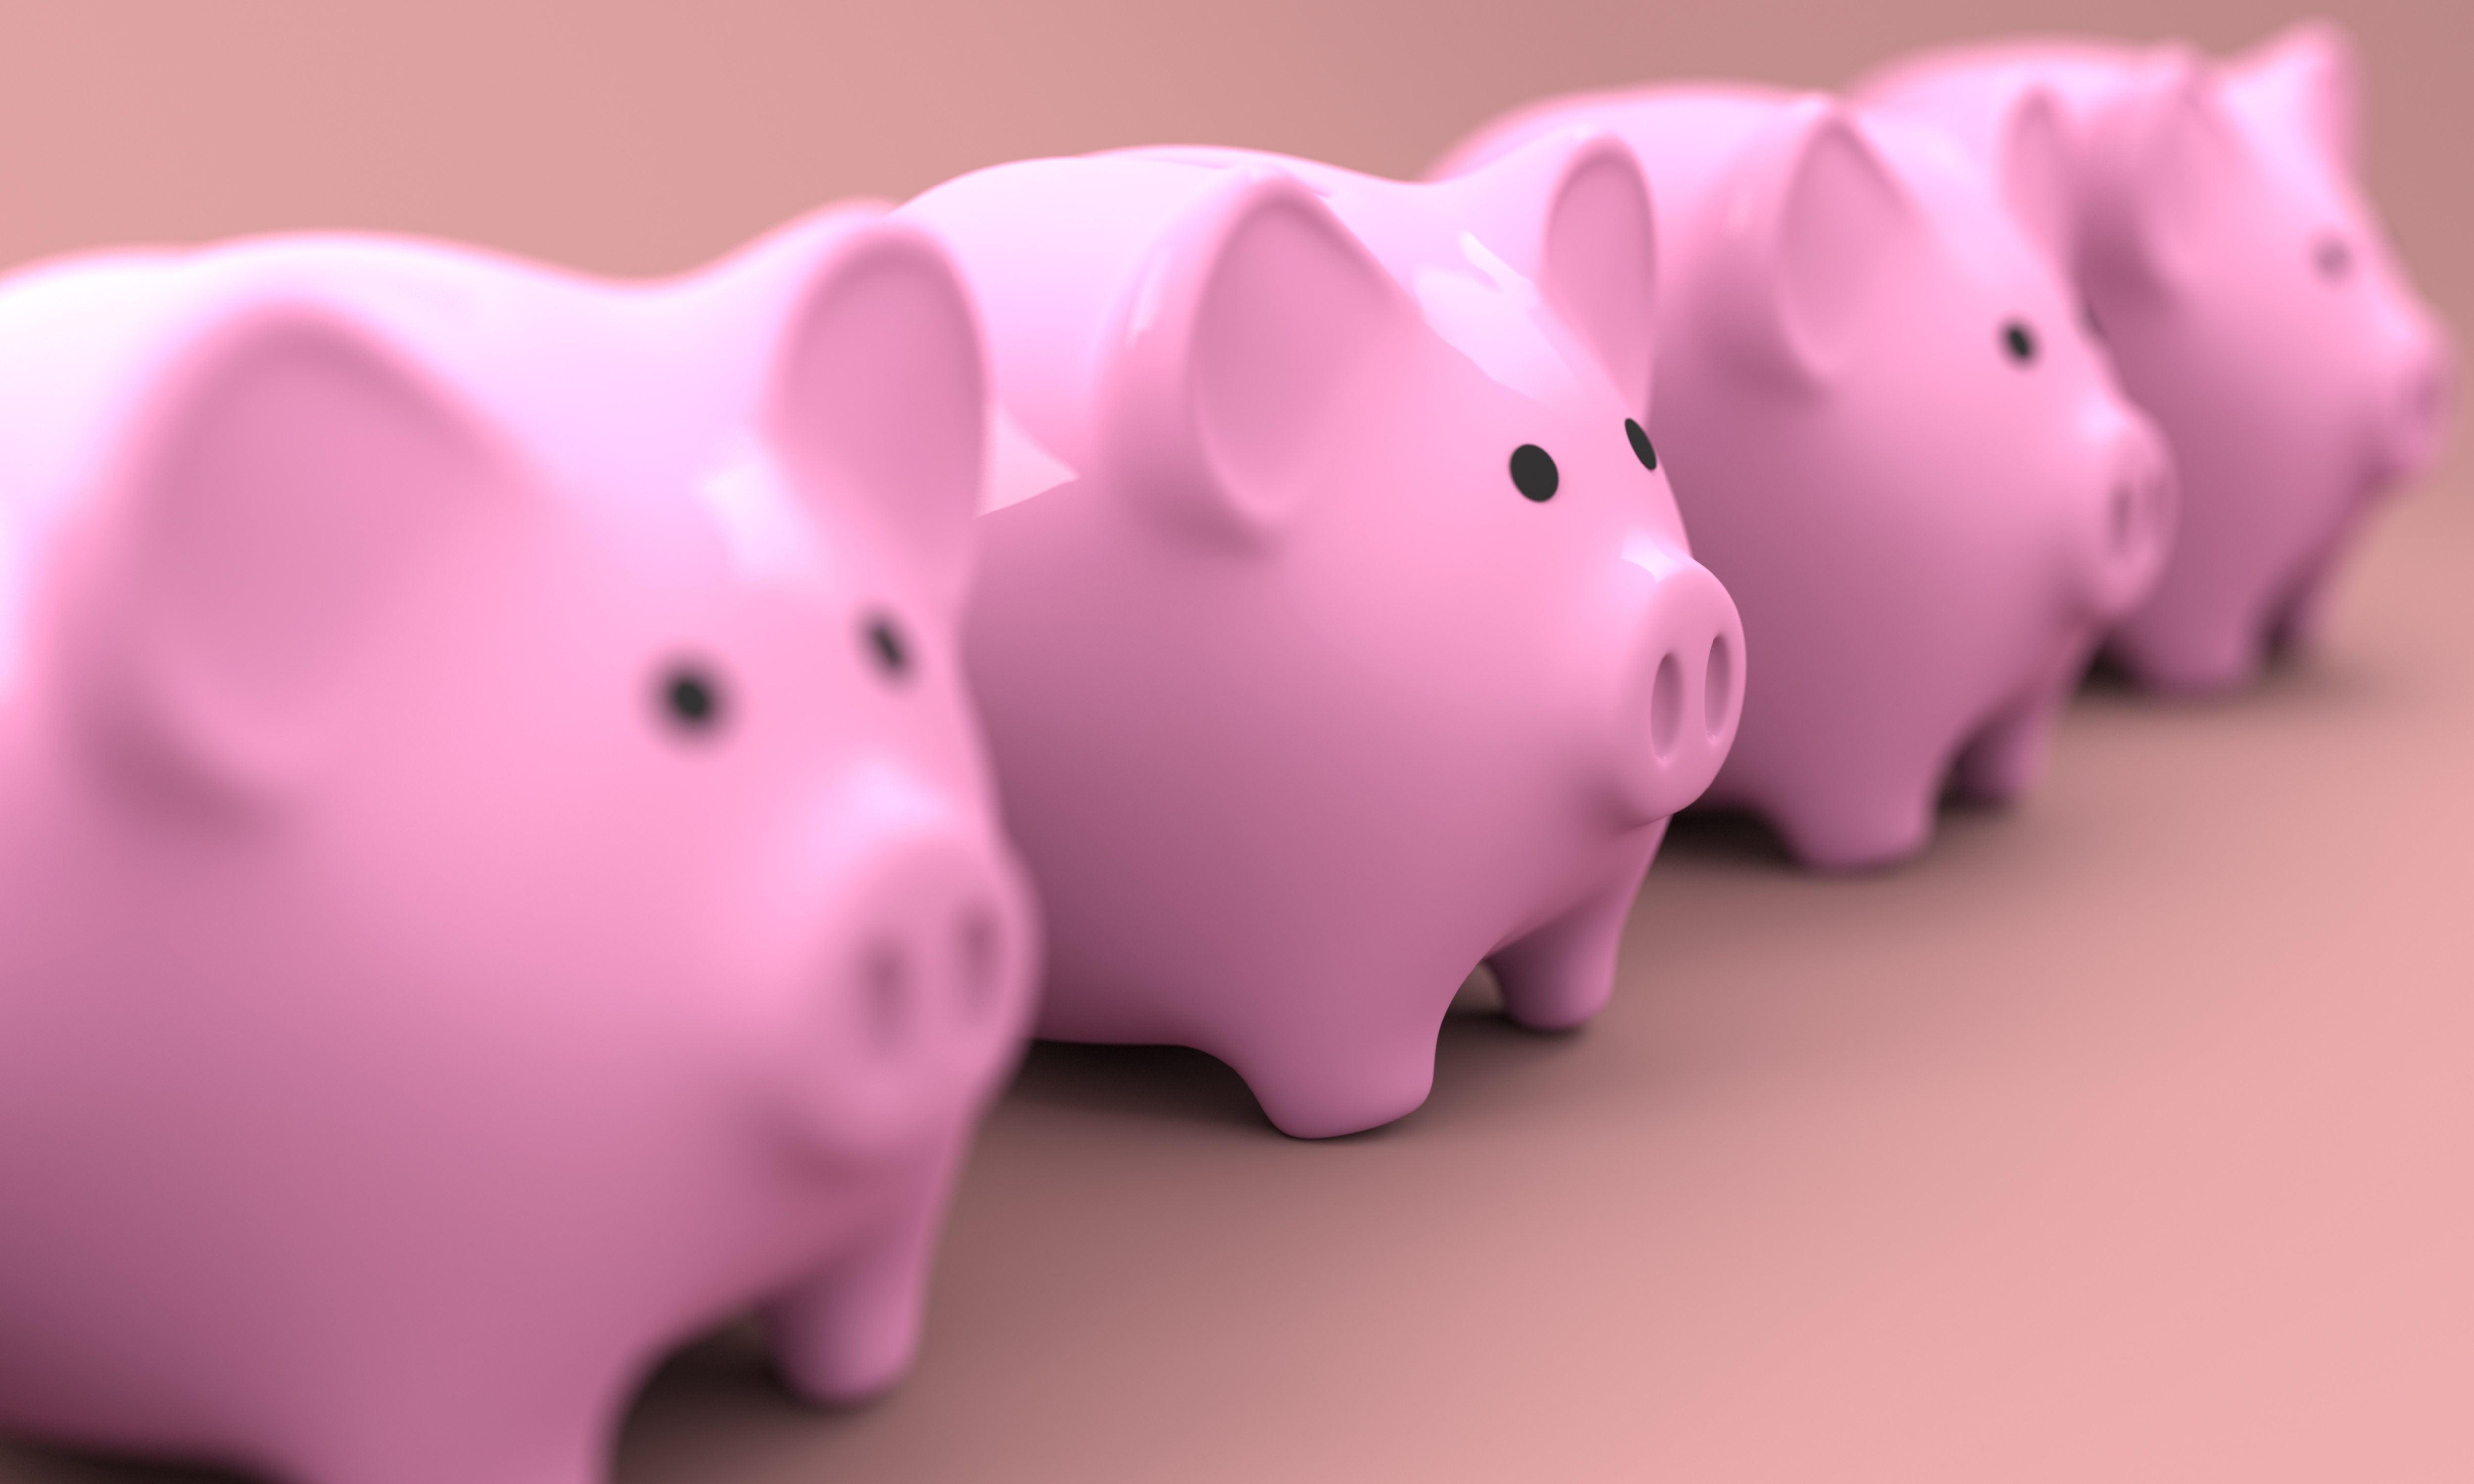 Superannuation, SMSF, retirement savings